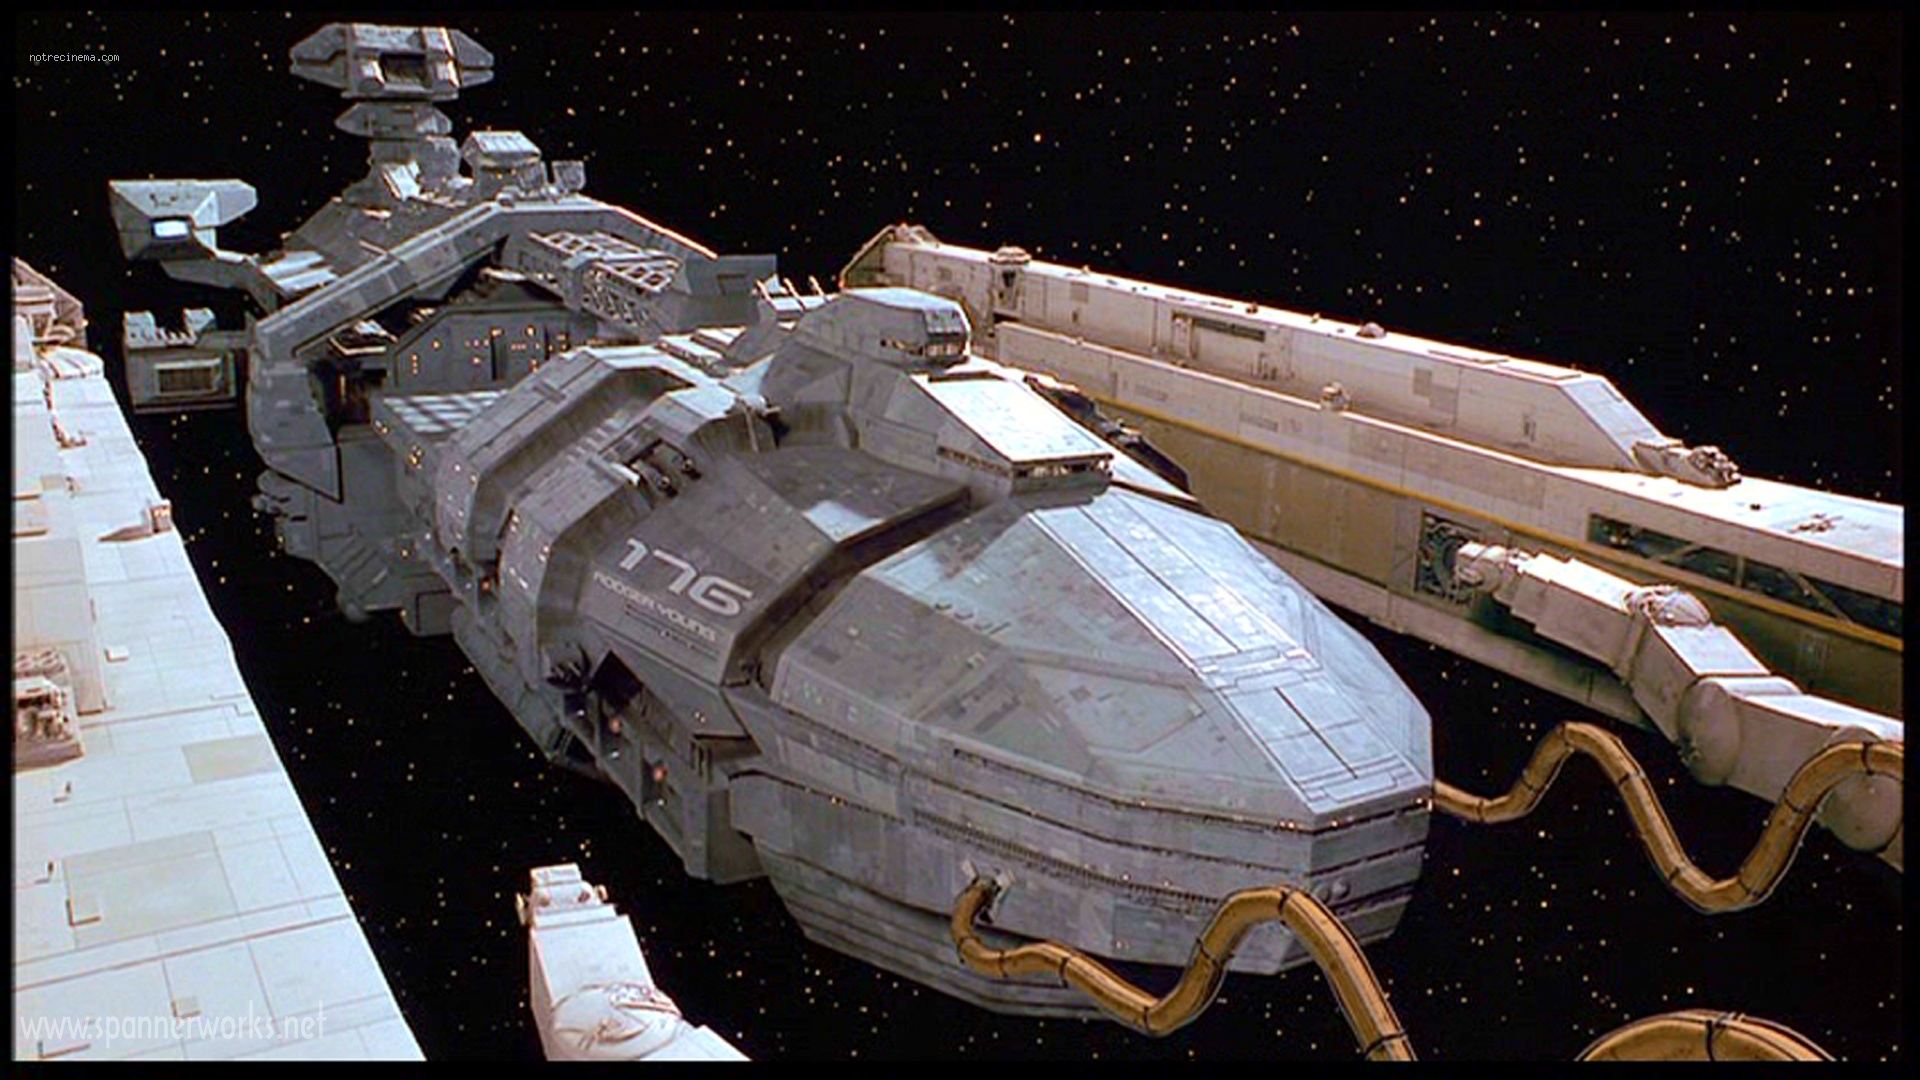 starship wallpaper troopers film custom detail communaute 1920x1080